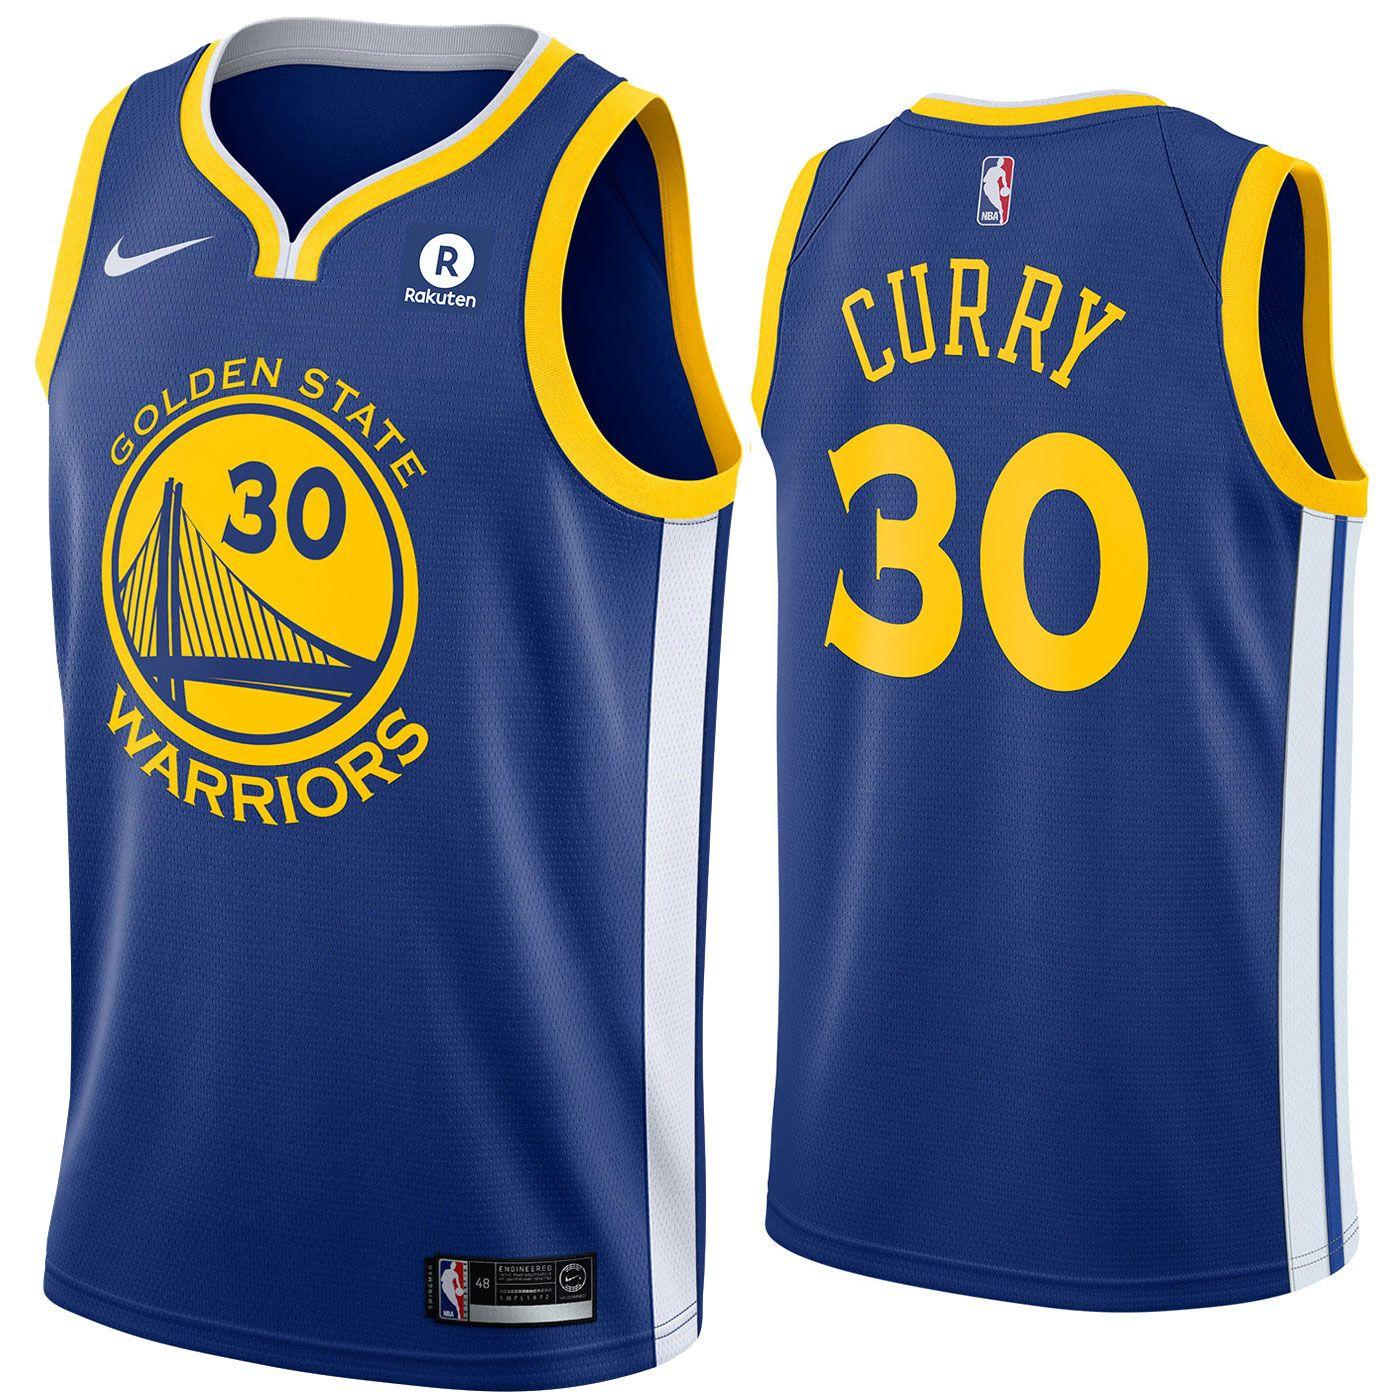 9ae02848 Golden State Warriors Nike Dri-FIT Men's Stephen Curry #30 Swingman Icon  Jersey - Royal